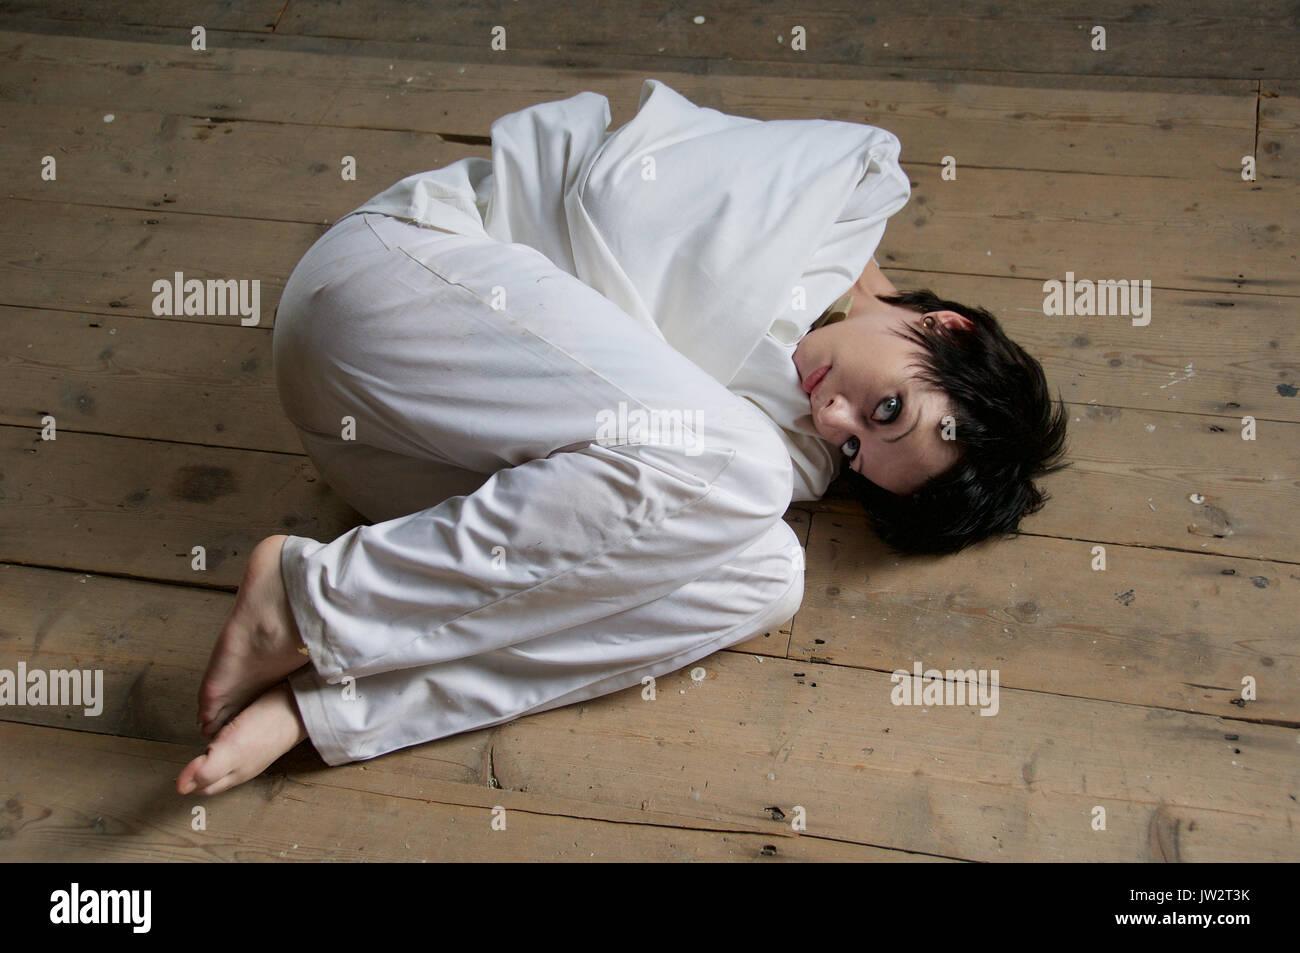 Straight Jacket Stock Photos & Straight Jacket Stock Images - Alamy